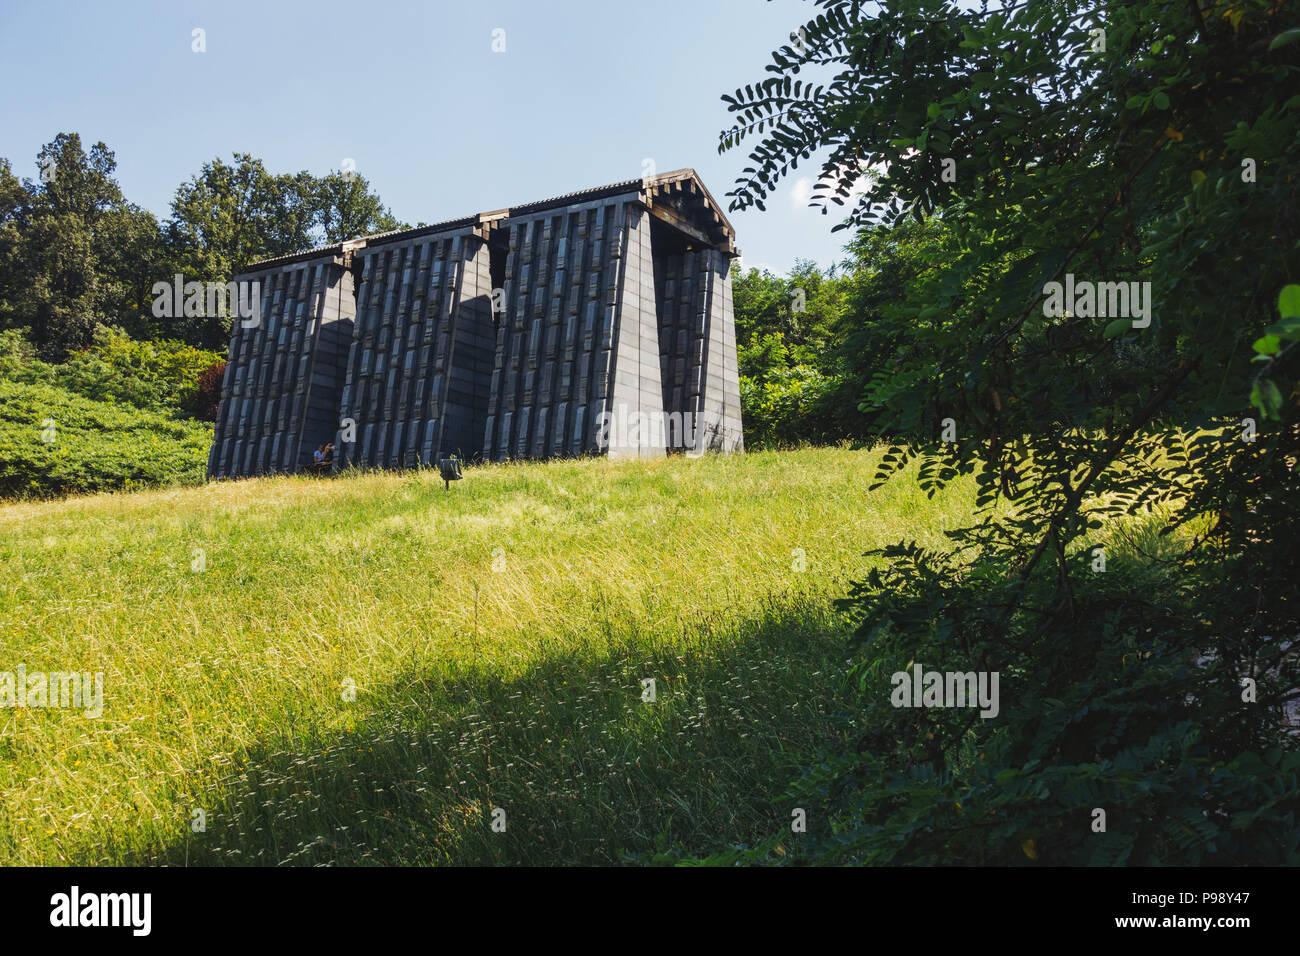 the dark concrete slabs of the Yugoslav-era Mausoleum of Struggle and Victory, Čačak, Serbia Stock Photo